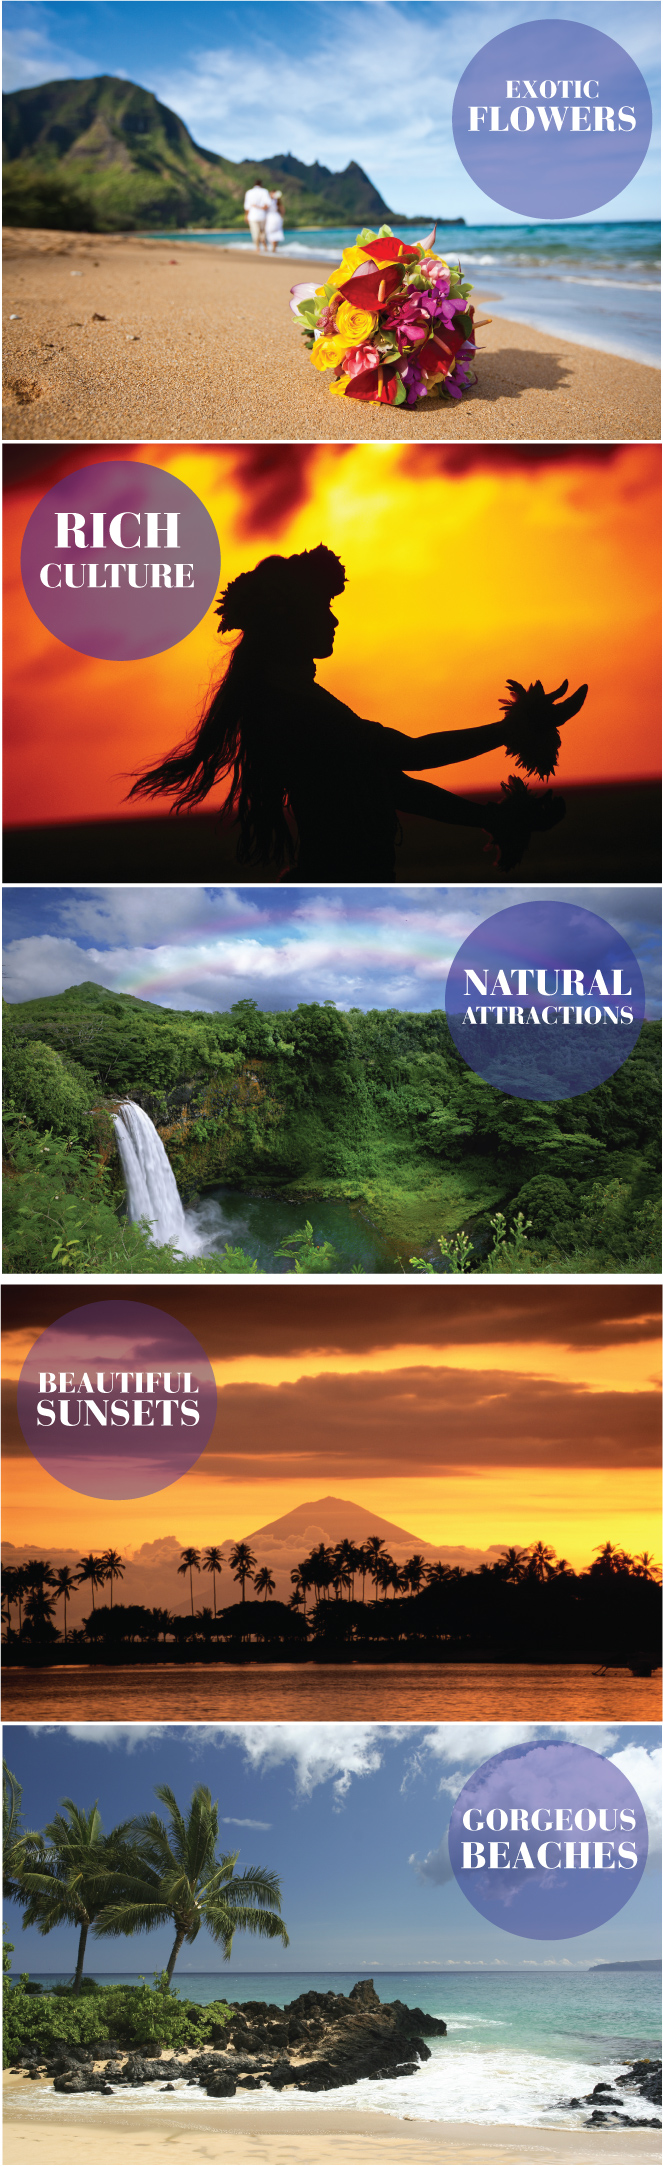 5 Reasons to have a destination #wedding or #honeymoon in HAWAII